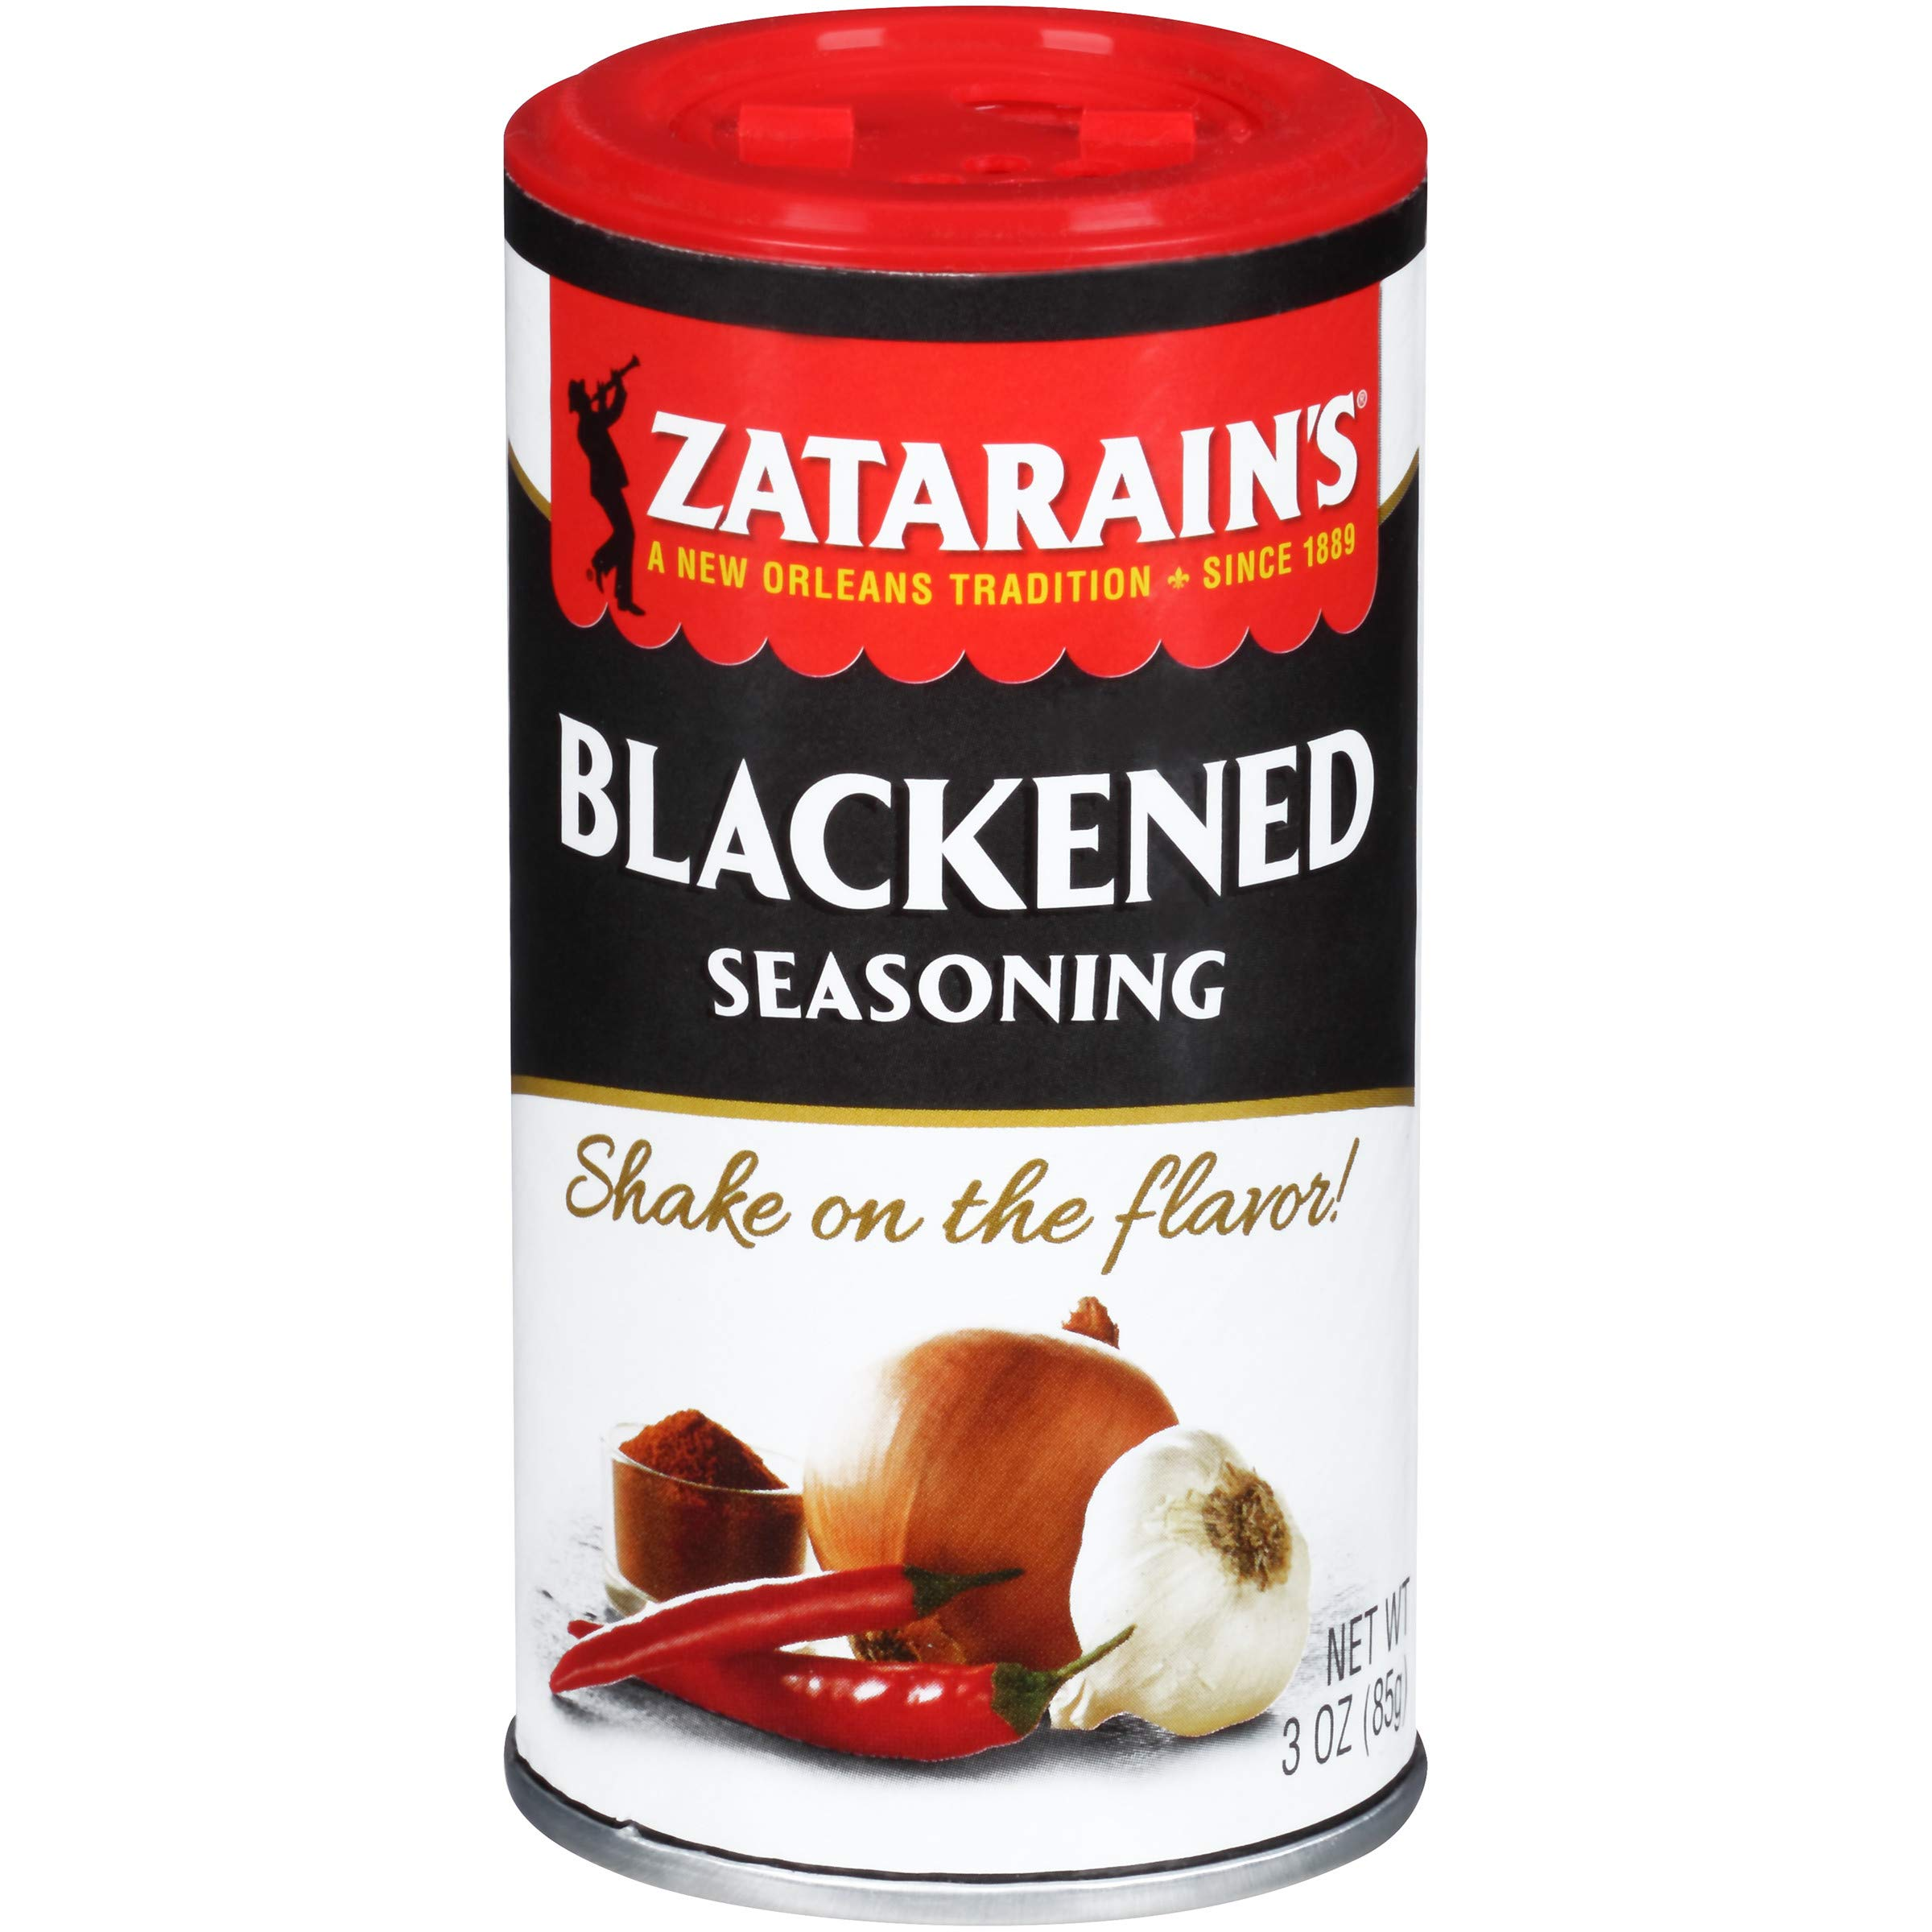 Zatarain's New Orleans Style Blackened Seasoning, 3 oz